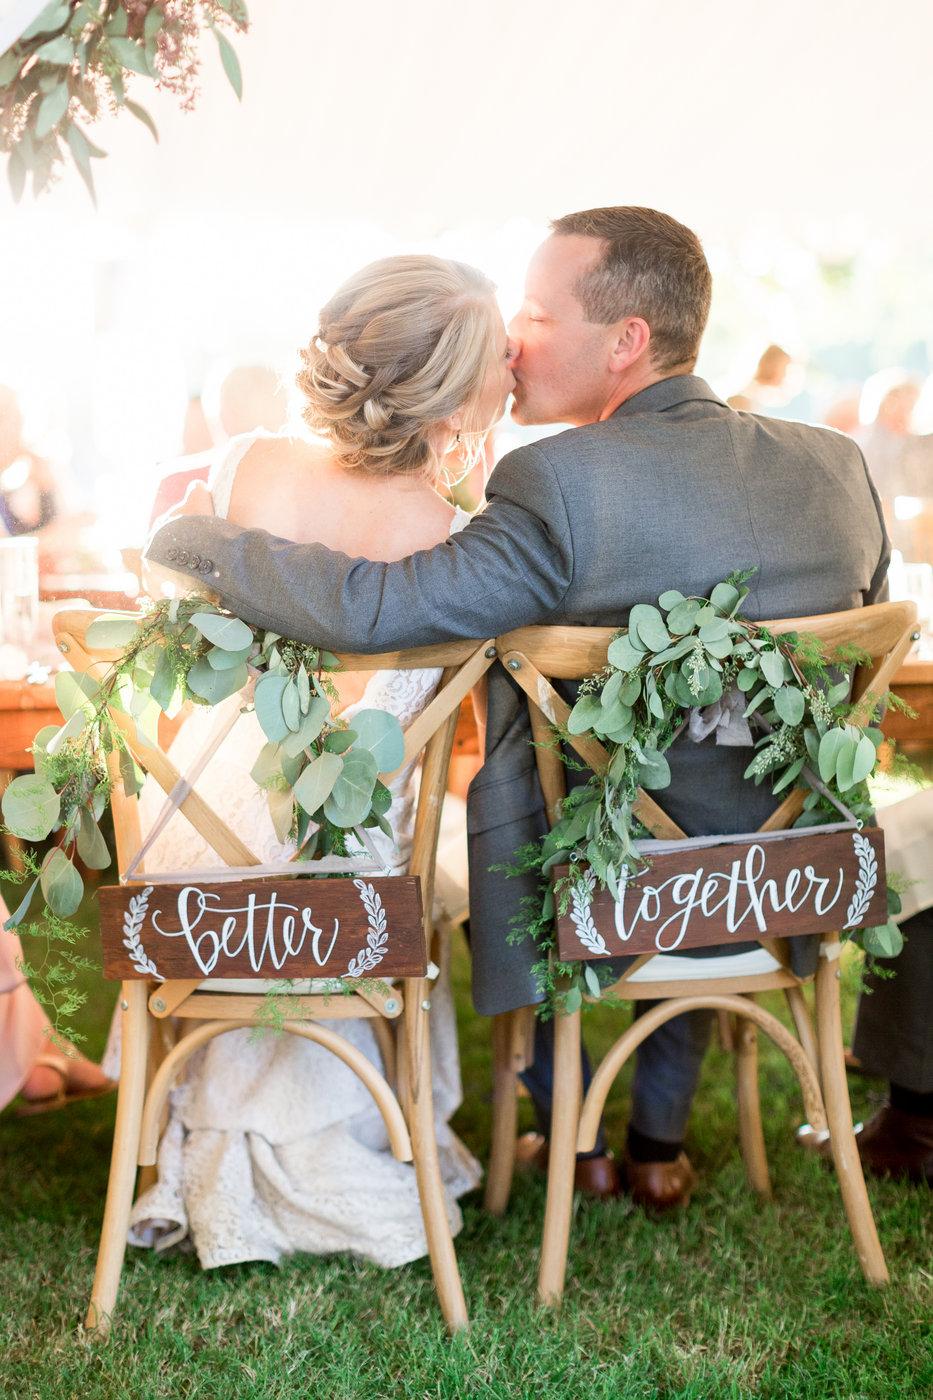 outdoor-wedding-reception-patrick-ranch-museum-in-durhamjpg